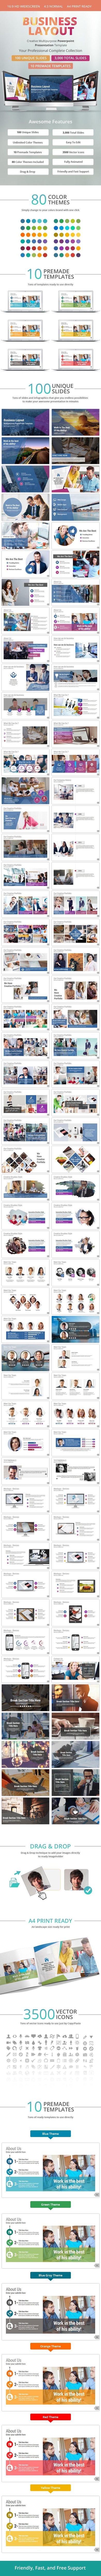 Business Layout PowerPoint Presentation Template - Business PowerPoint Templates